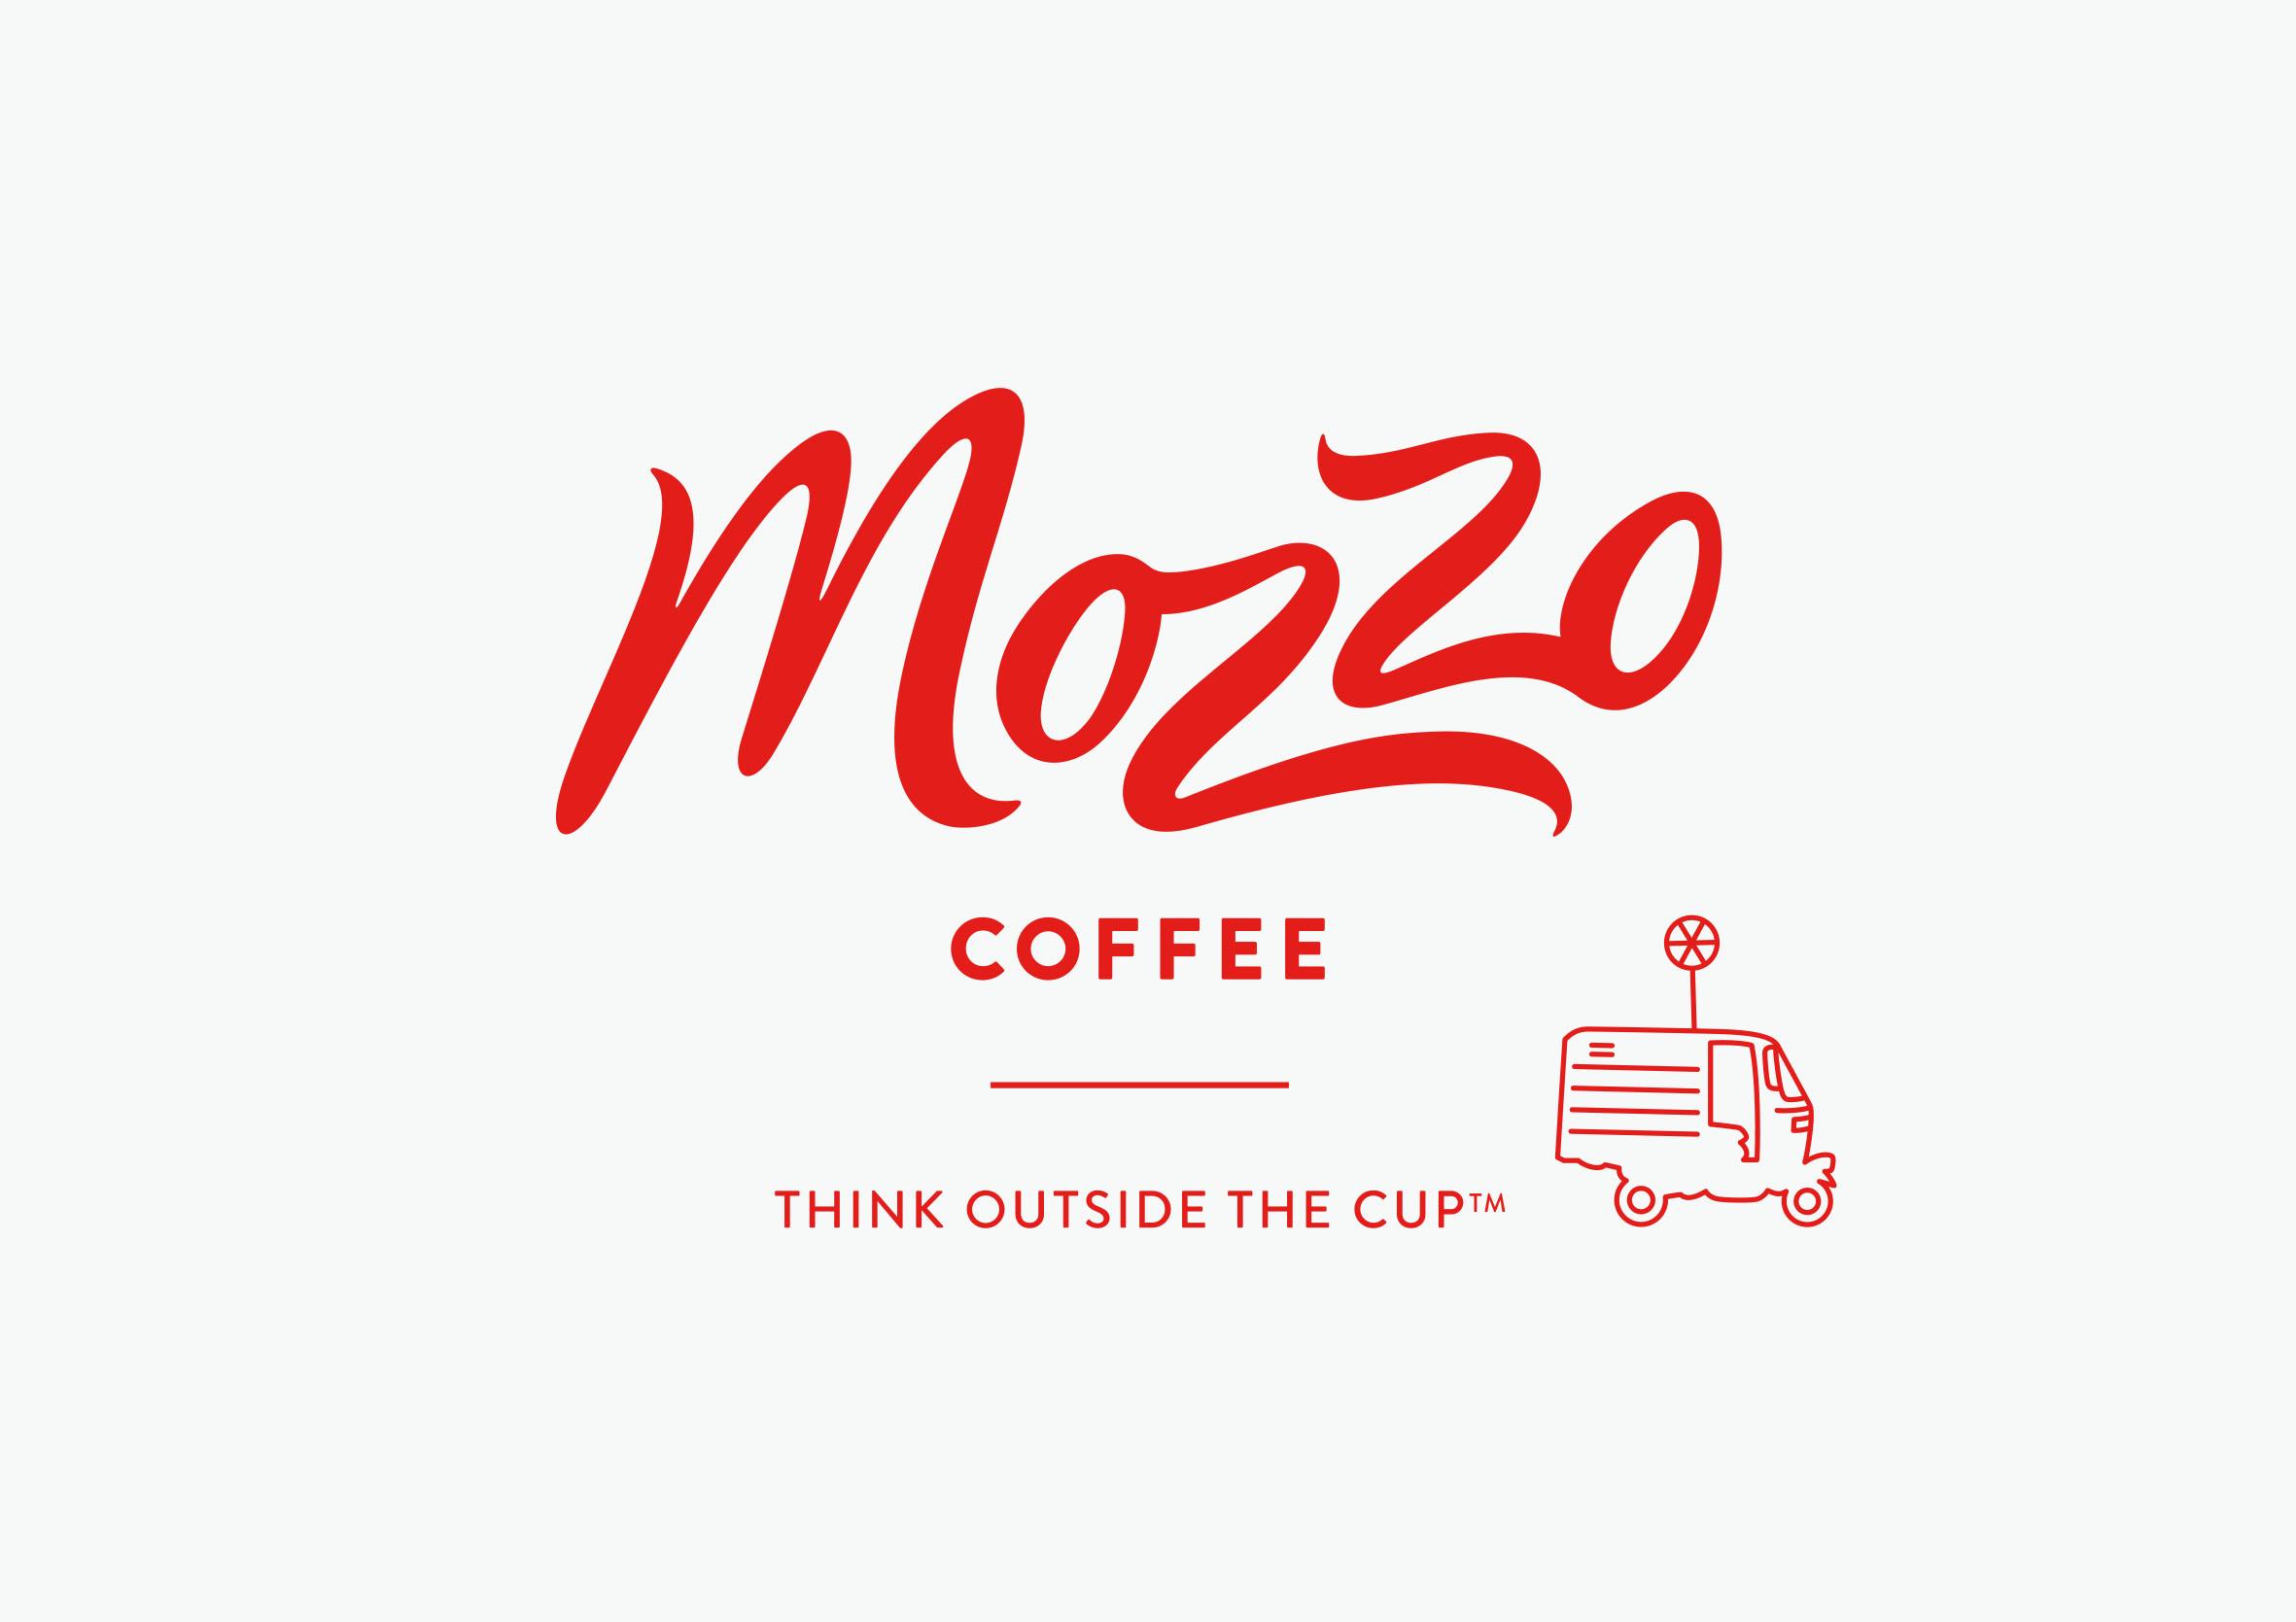 Mozzo_ThinkingCX_Brand_Strategy_02.jpg